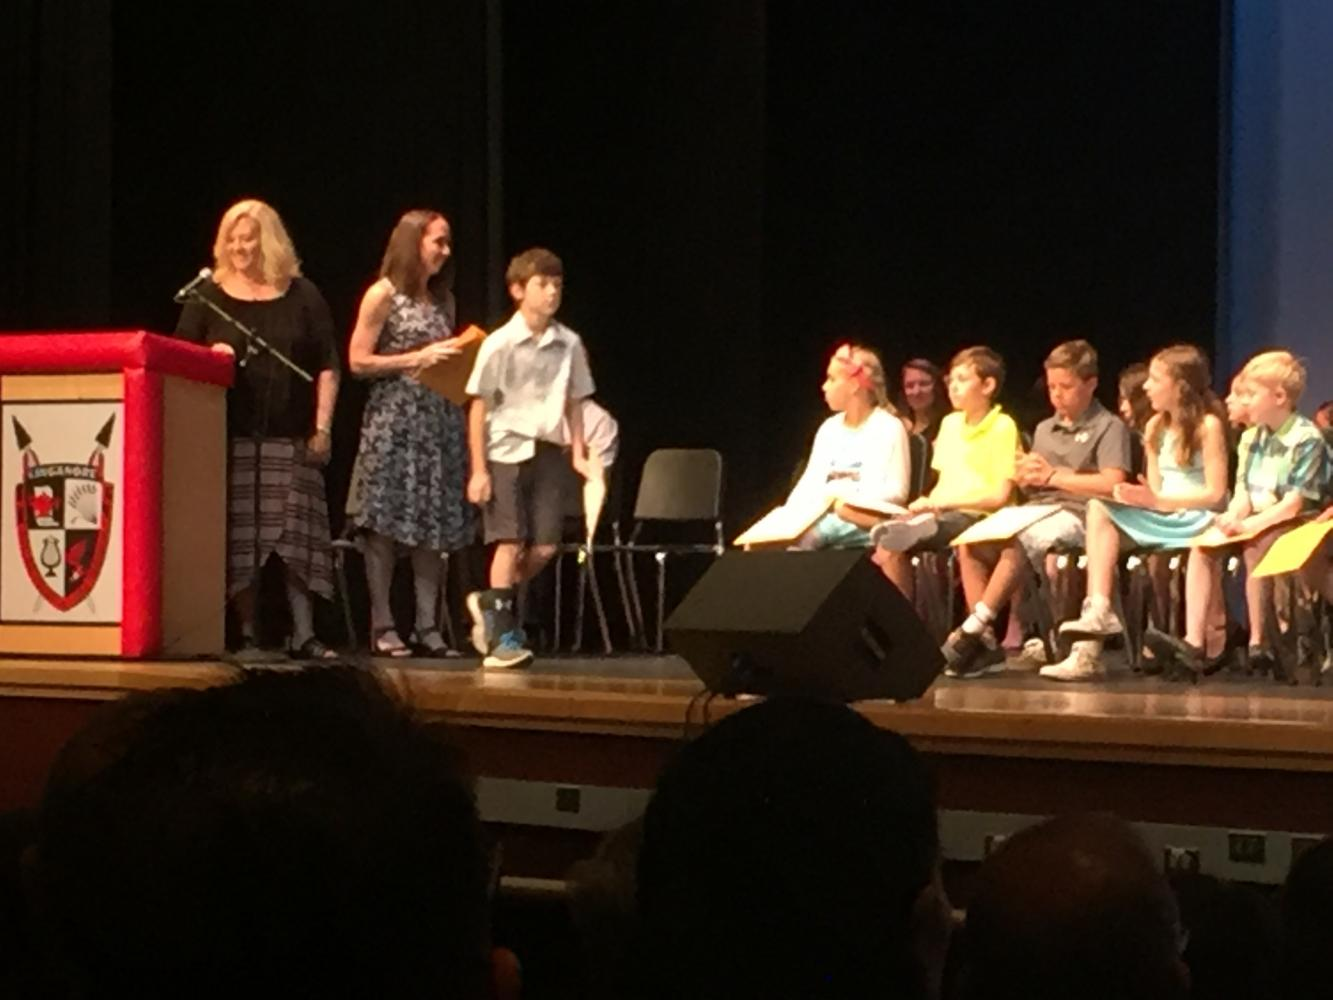 Fifth grader John Lehman receives his graduation certificate.